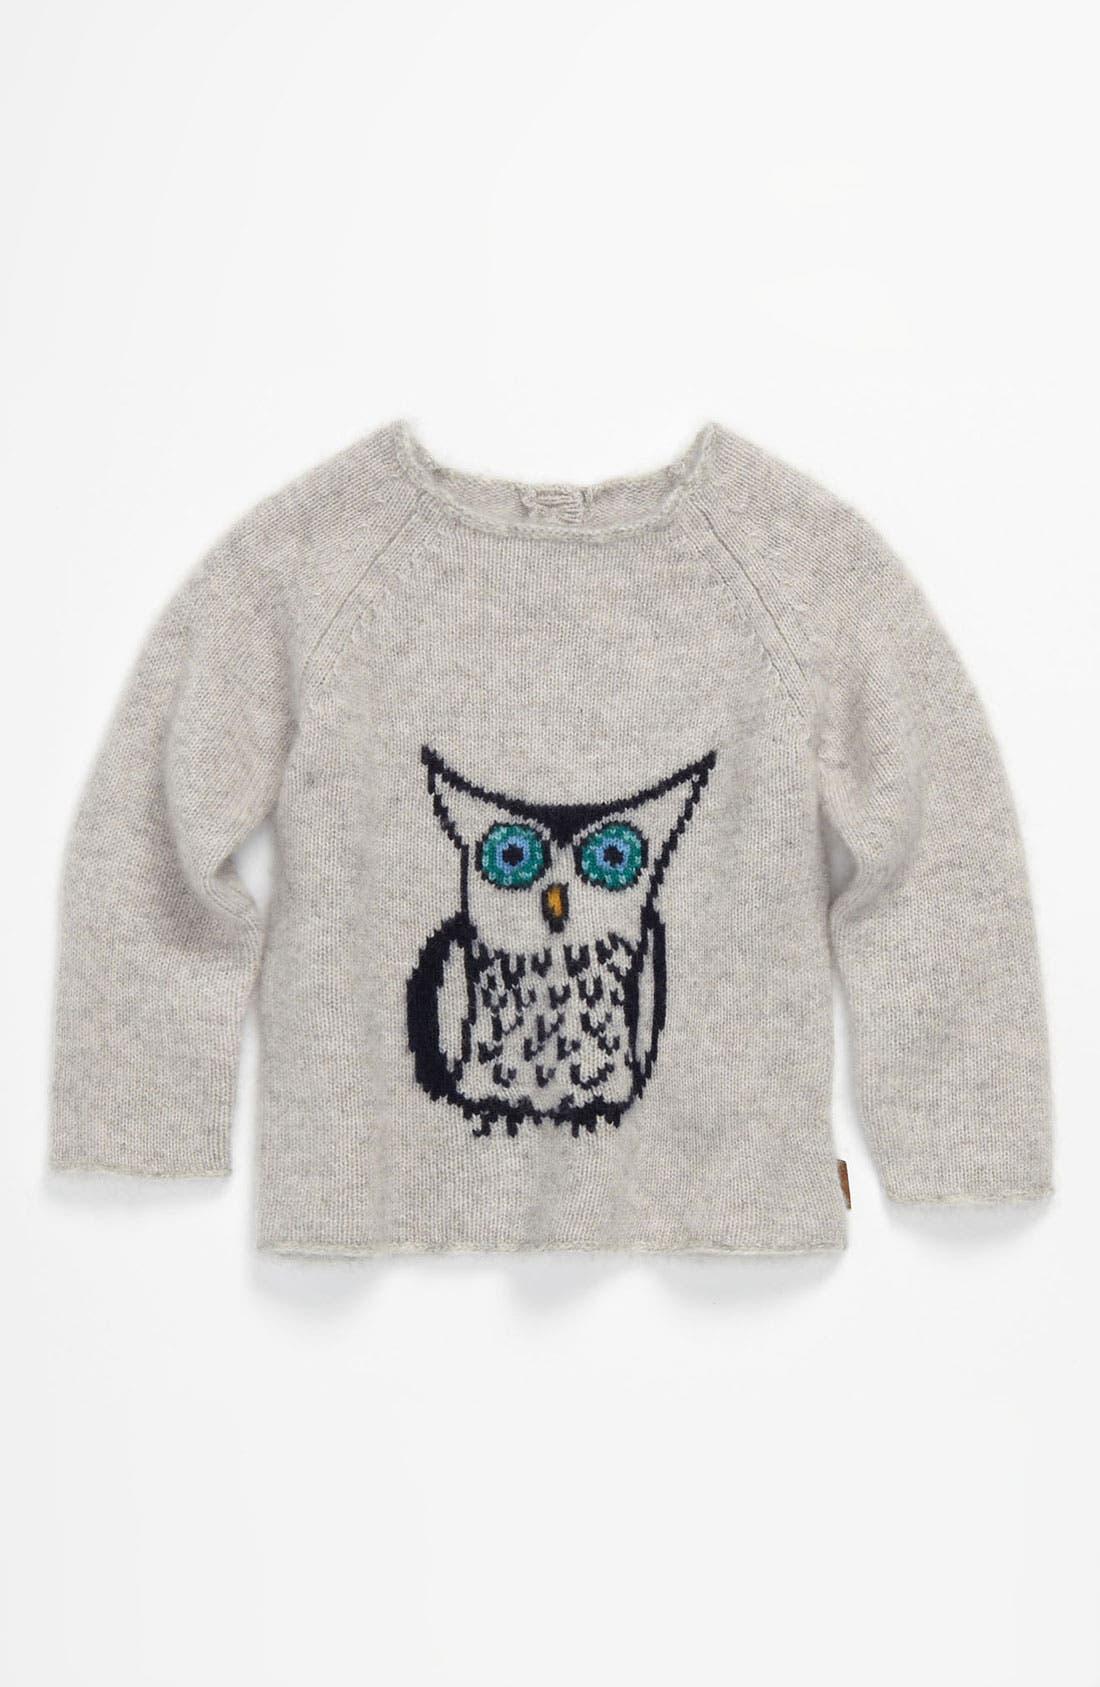 Main Image - Burberry 'Tova' Owl Intarsia Cashmere Sweater (Infant)